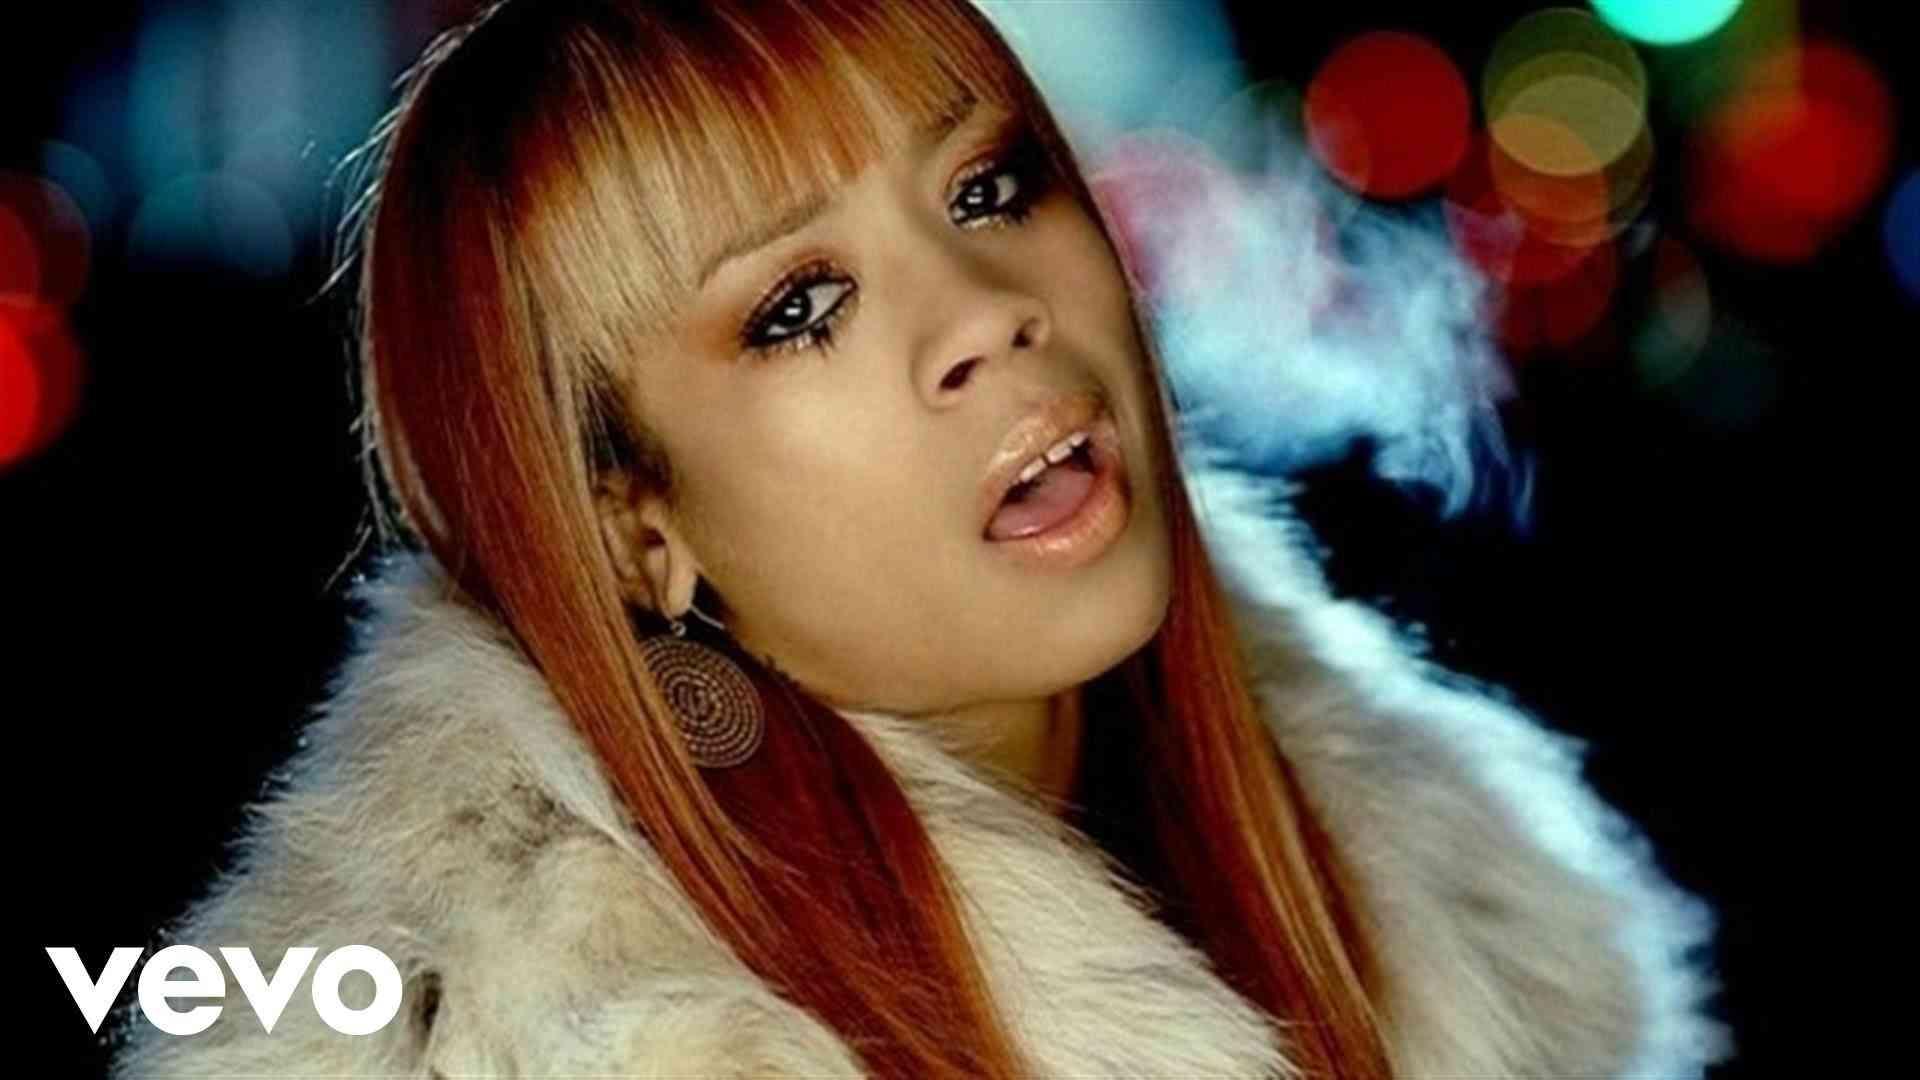 Keyshia Cole - Love (Alt. Version) - YouTube